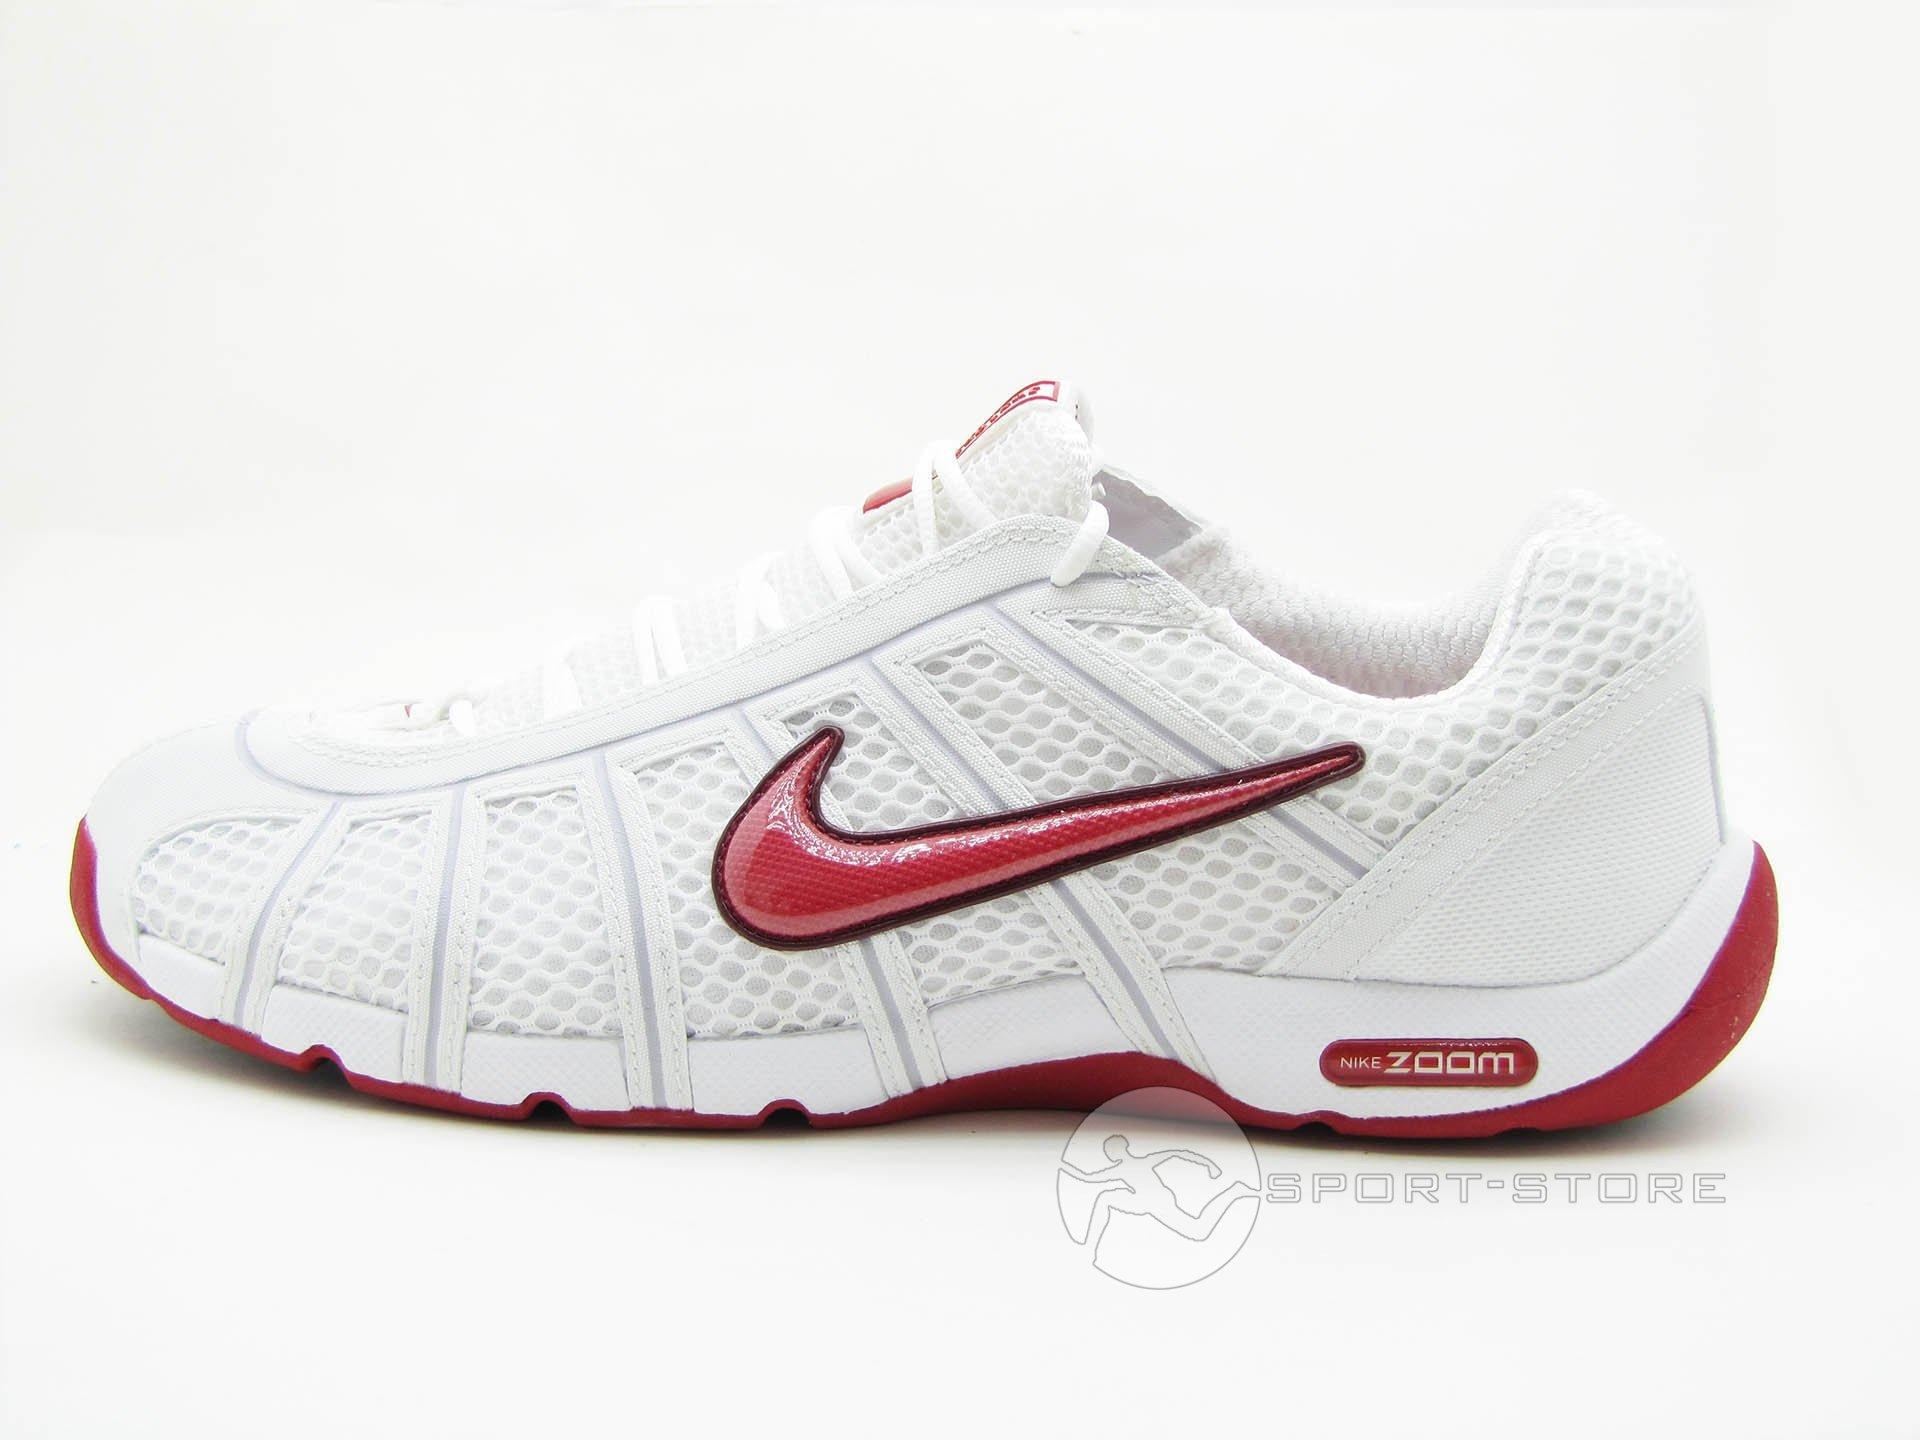 e90f716cc72 Обувь для фехтования NIKE AIR ZOOM FENCER в интернет-магазине Sport ...